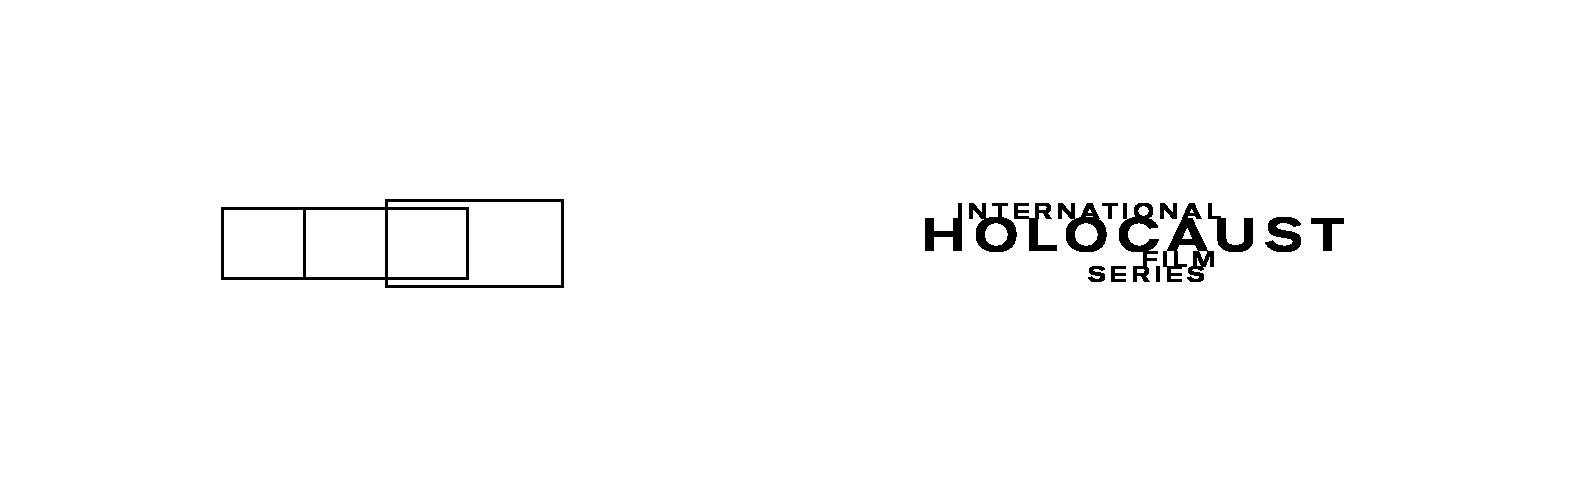 GDHolocaustLogo-10